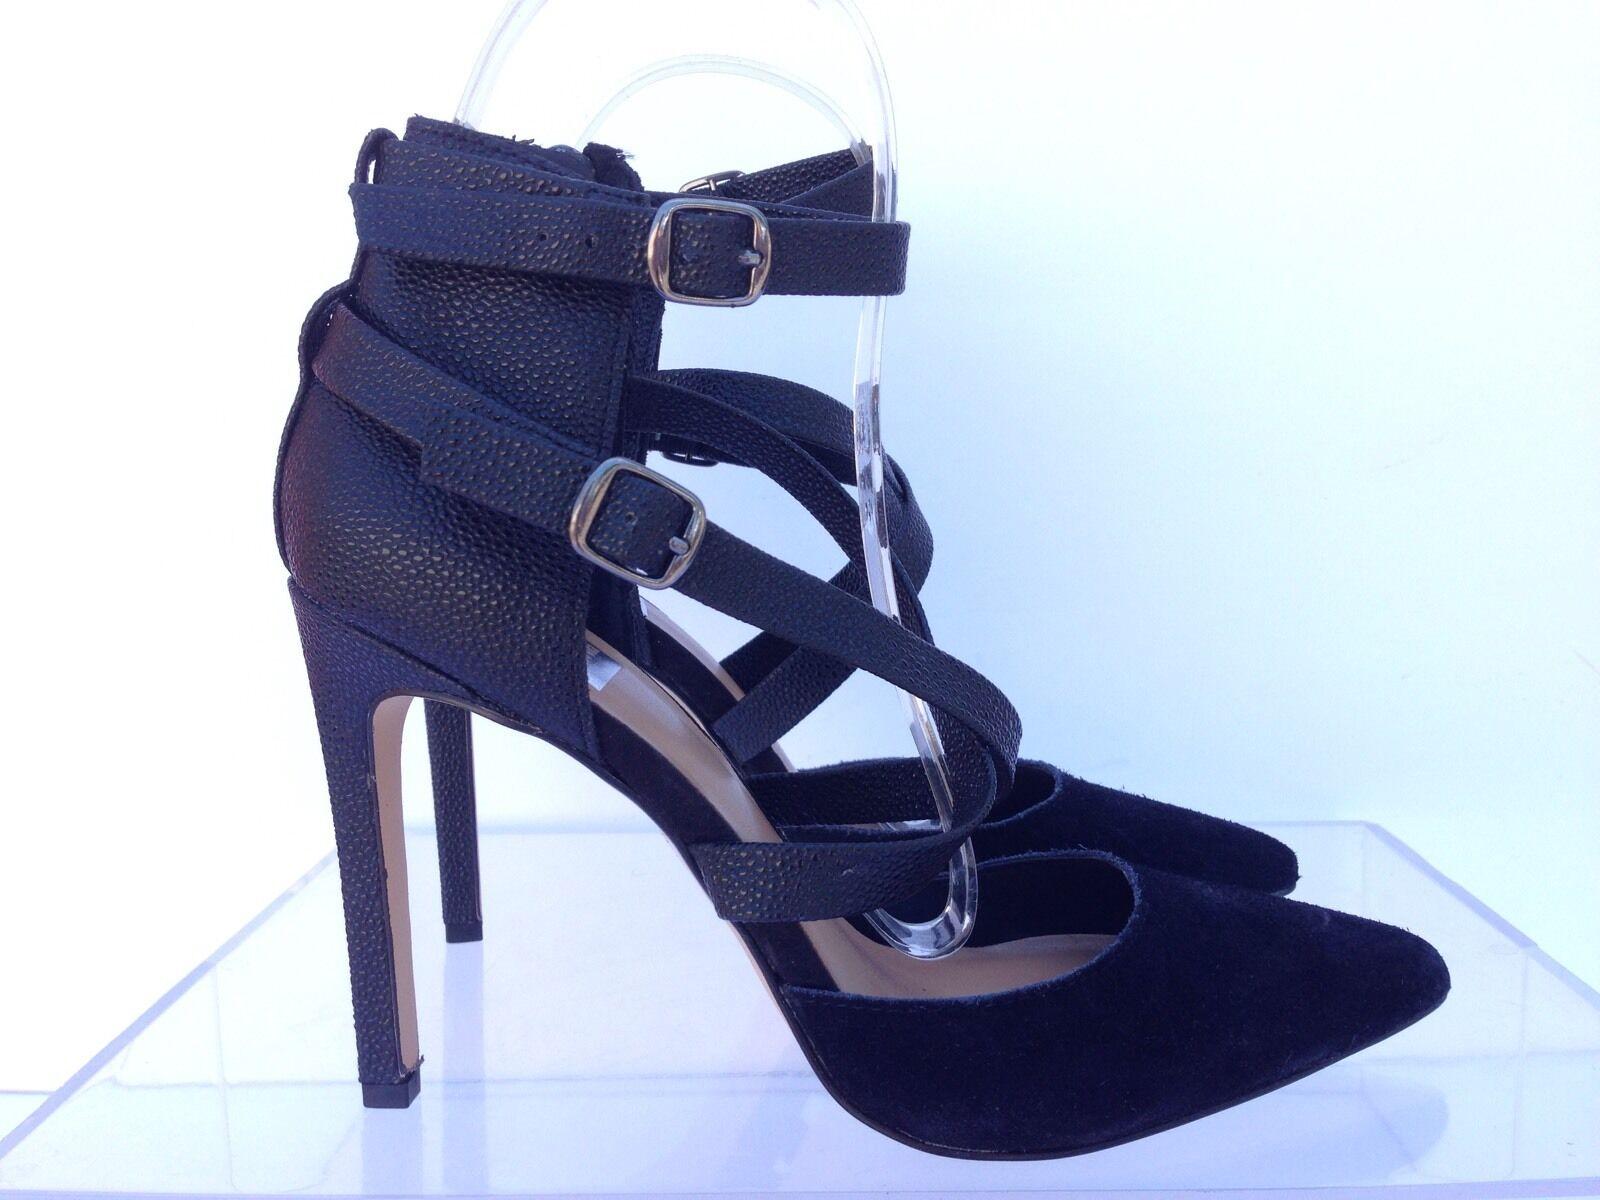 DV Dolce Vita Vita Dolce High Heels Strappy Schuhes Stylish Größe 7 98bde5